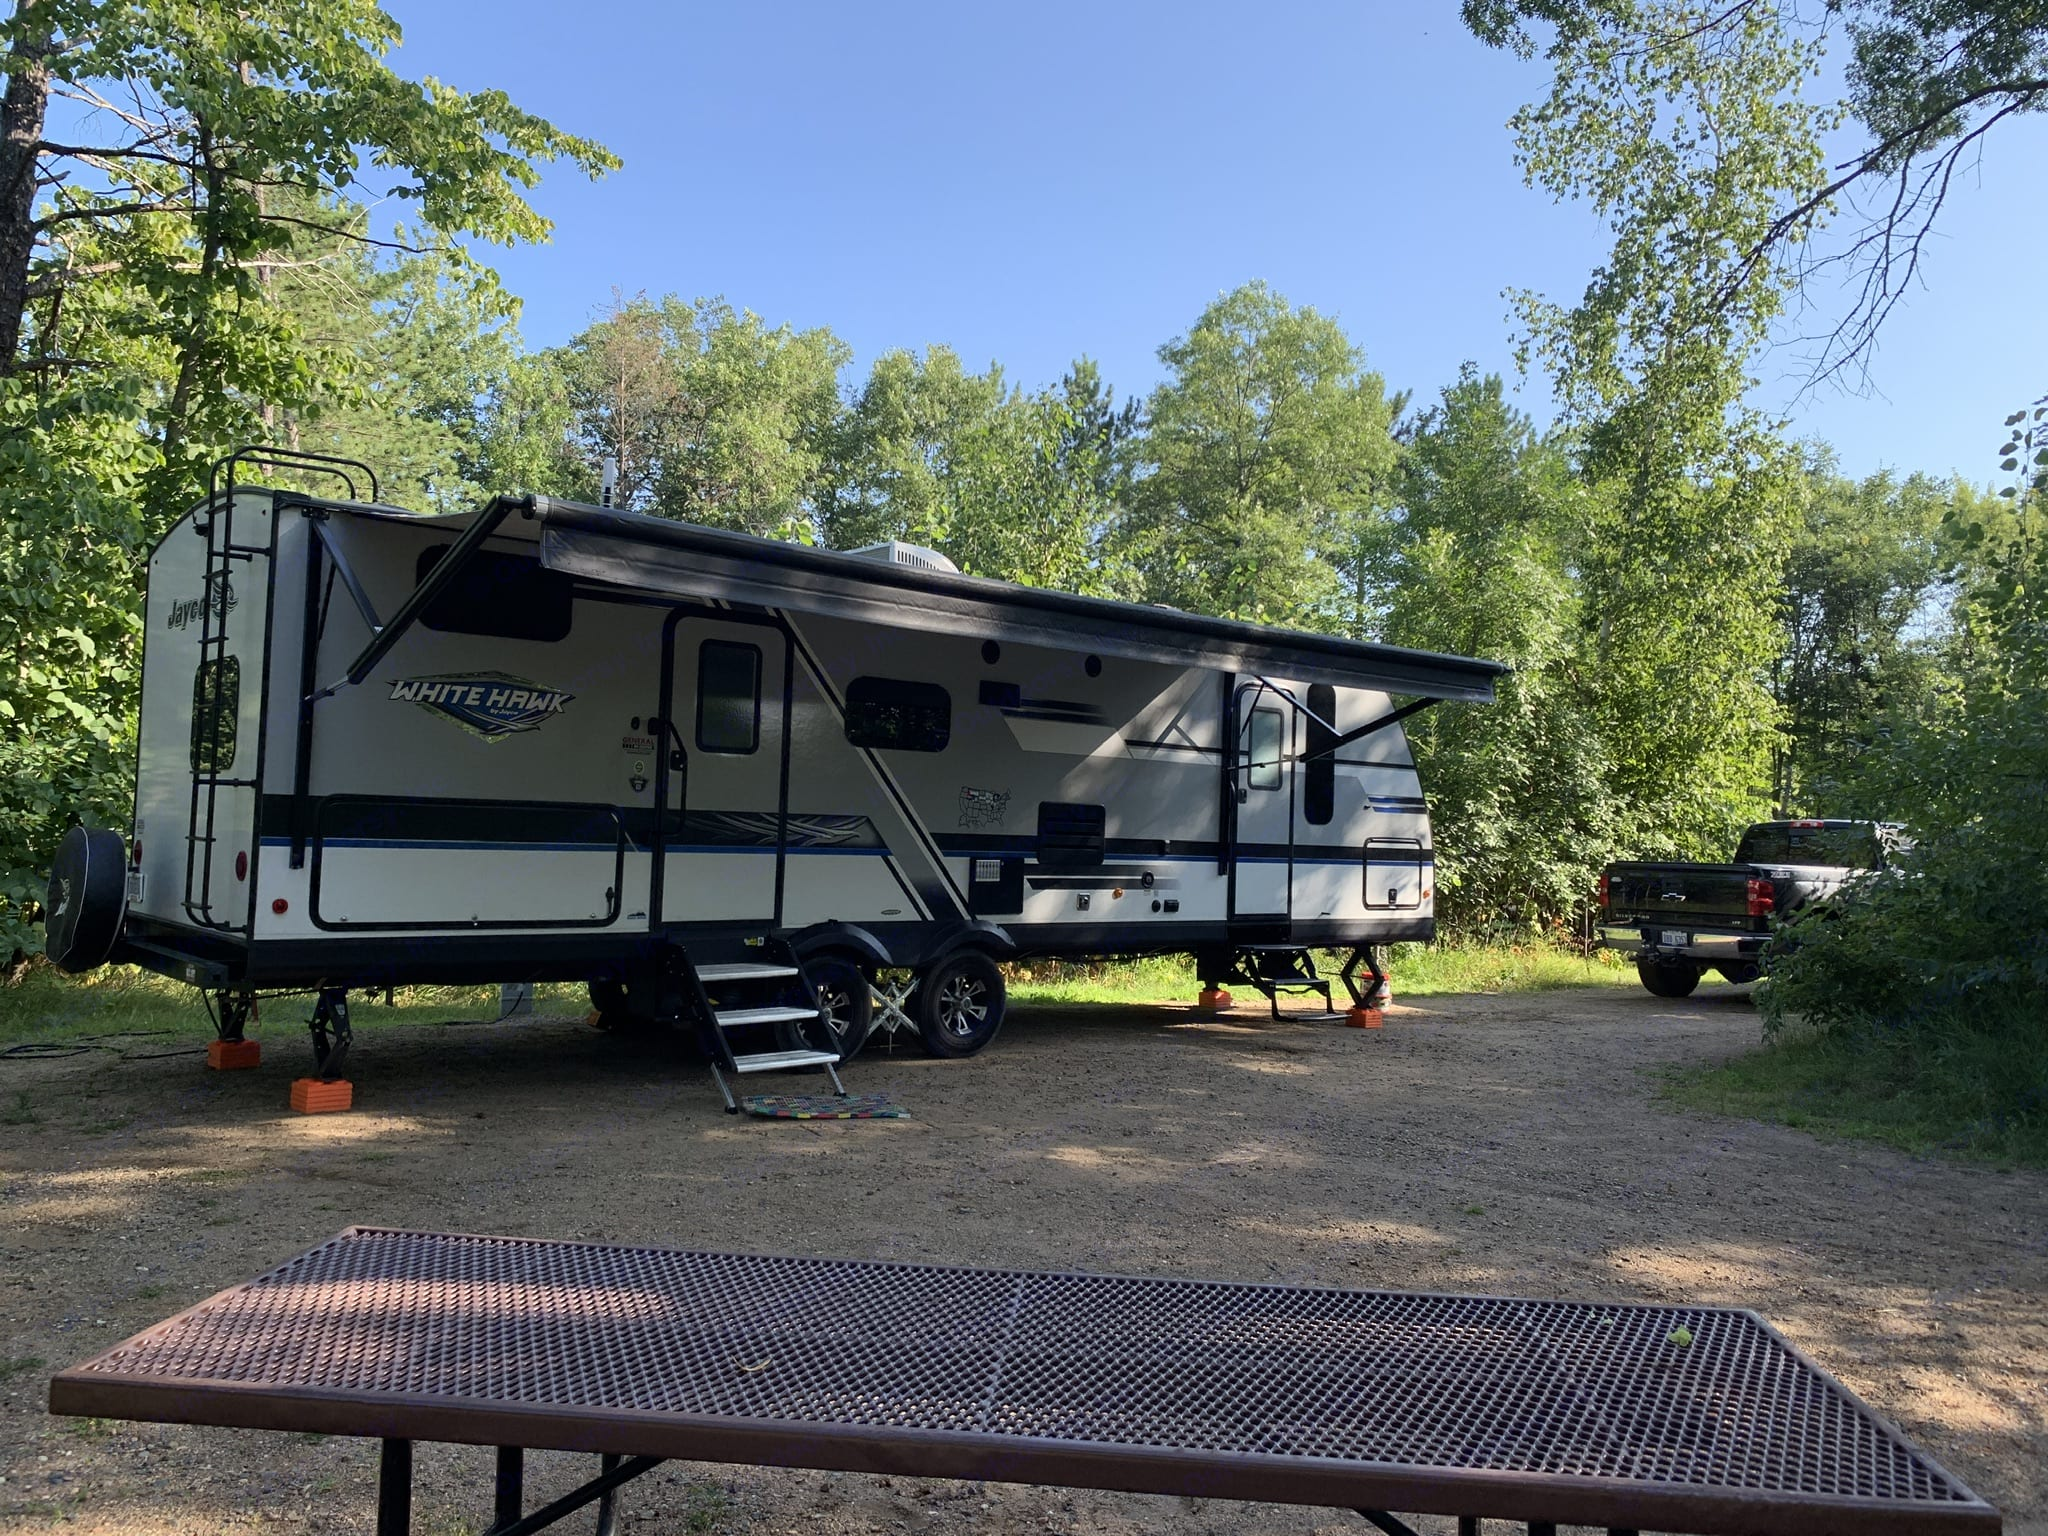 Campsite View. Jayco White Hawk 29Bh 2018